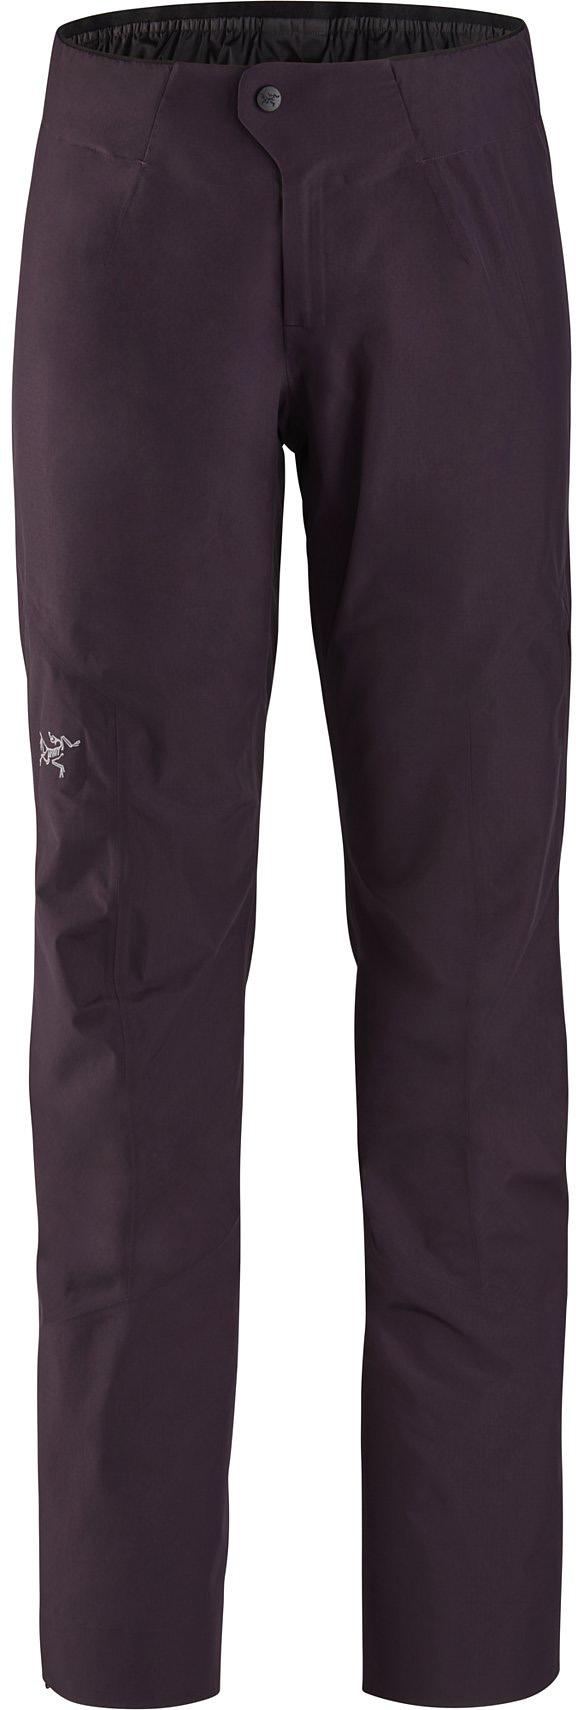 Arcteryx Womens Zeta Sl Pant Womens Trouser